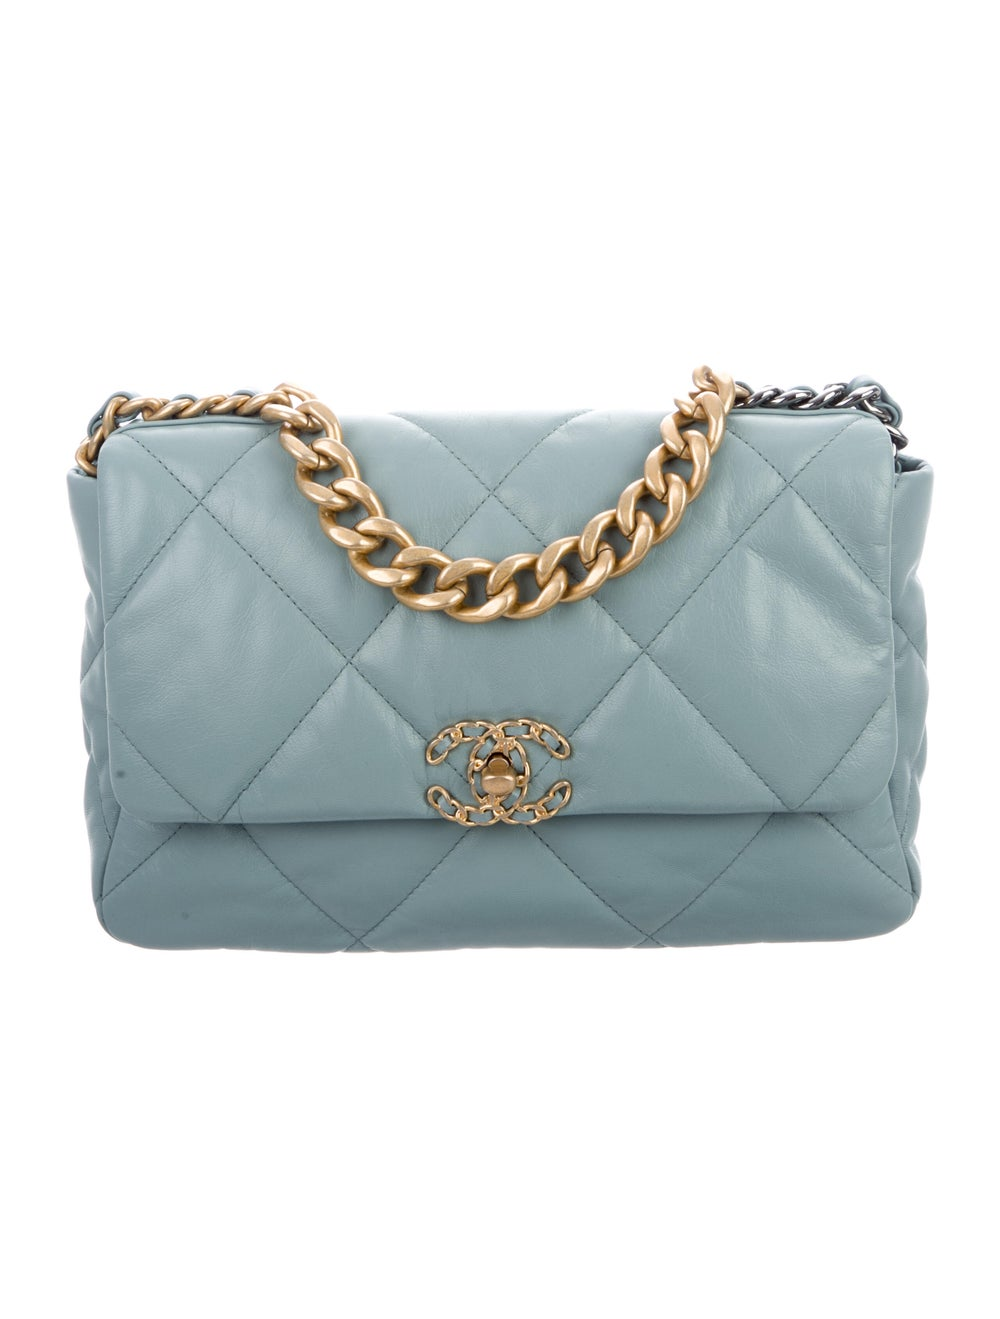 Chanel 2020 Large 19 Flap Bag Blue - image 1